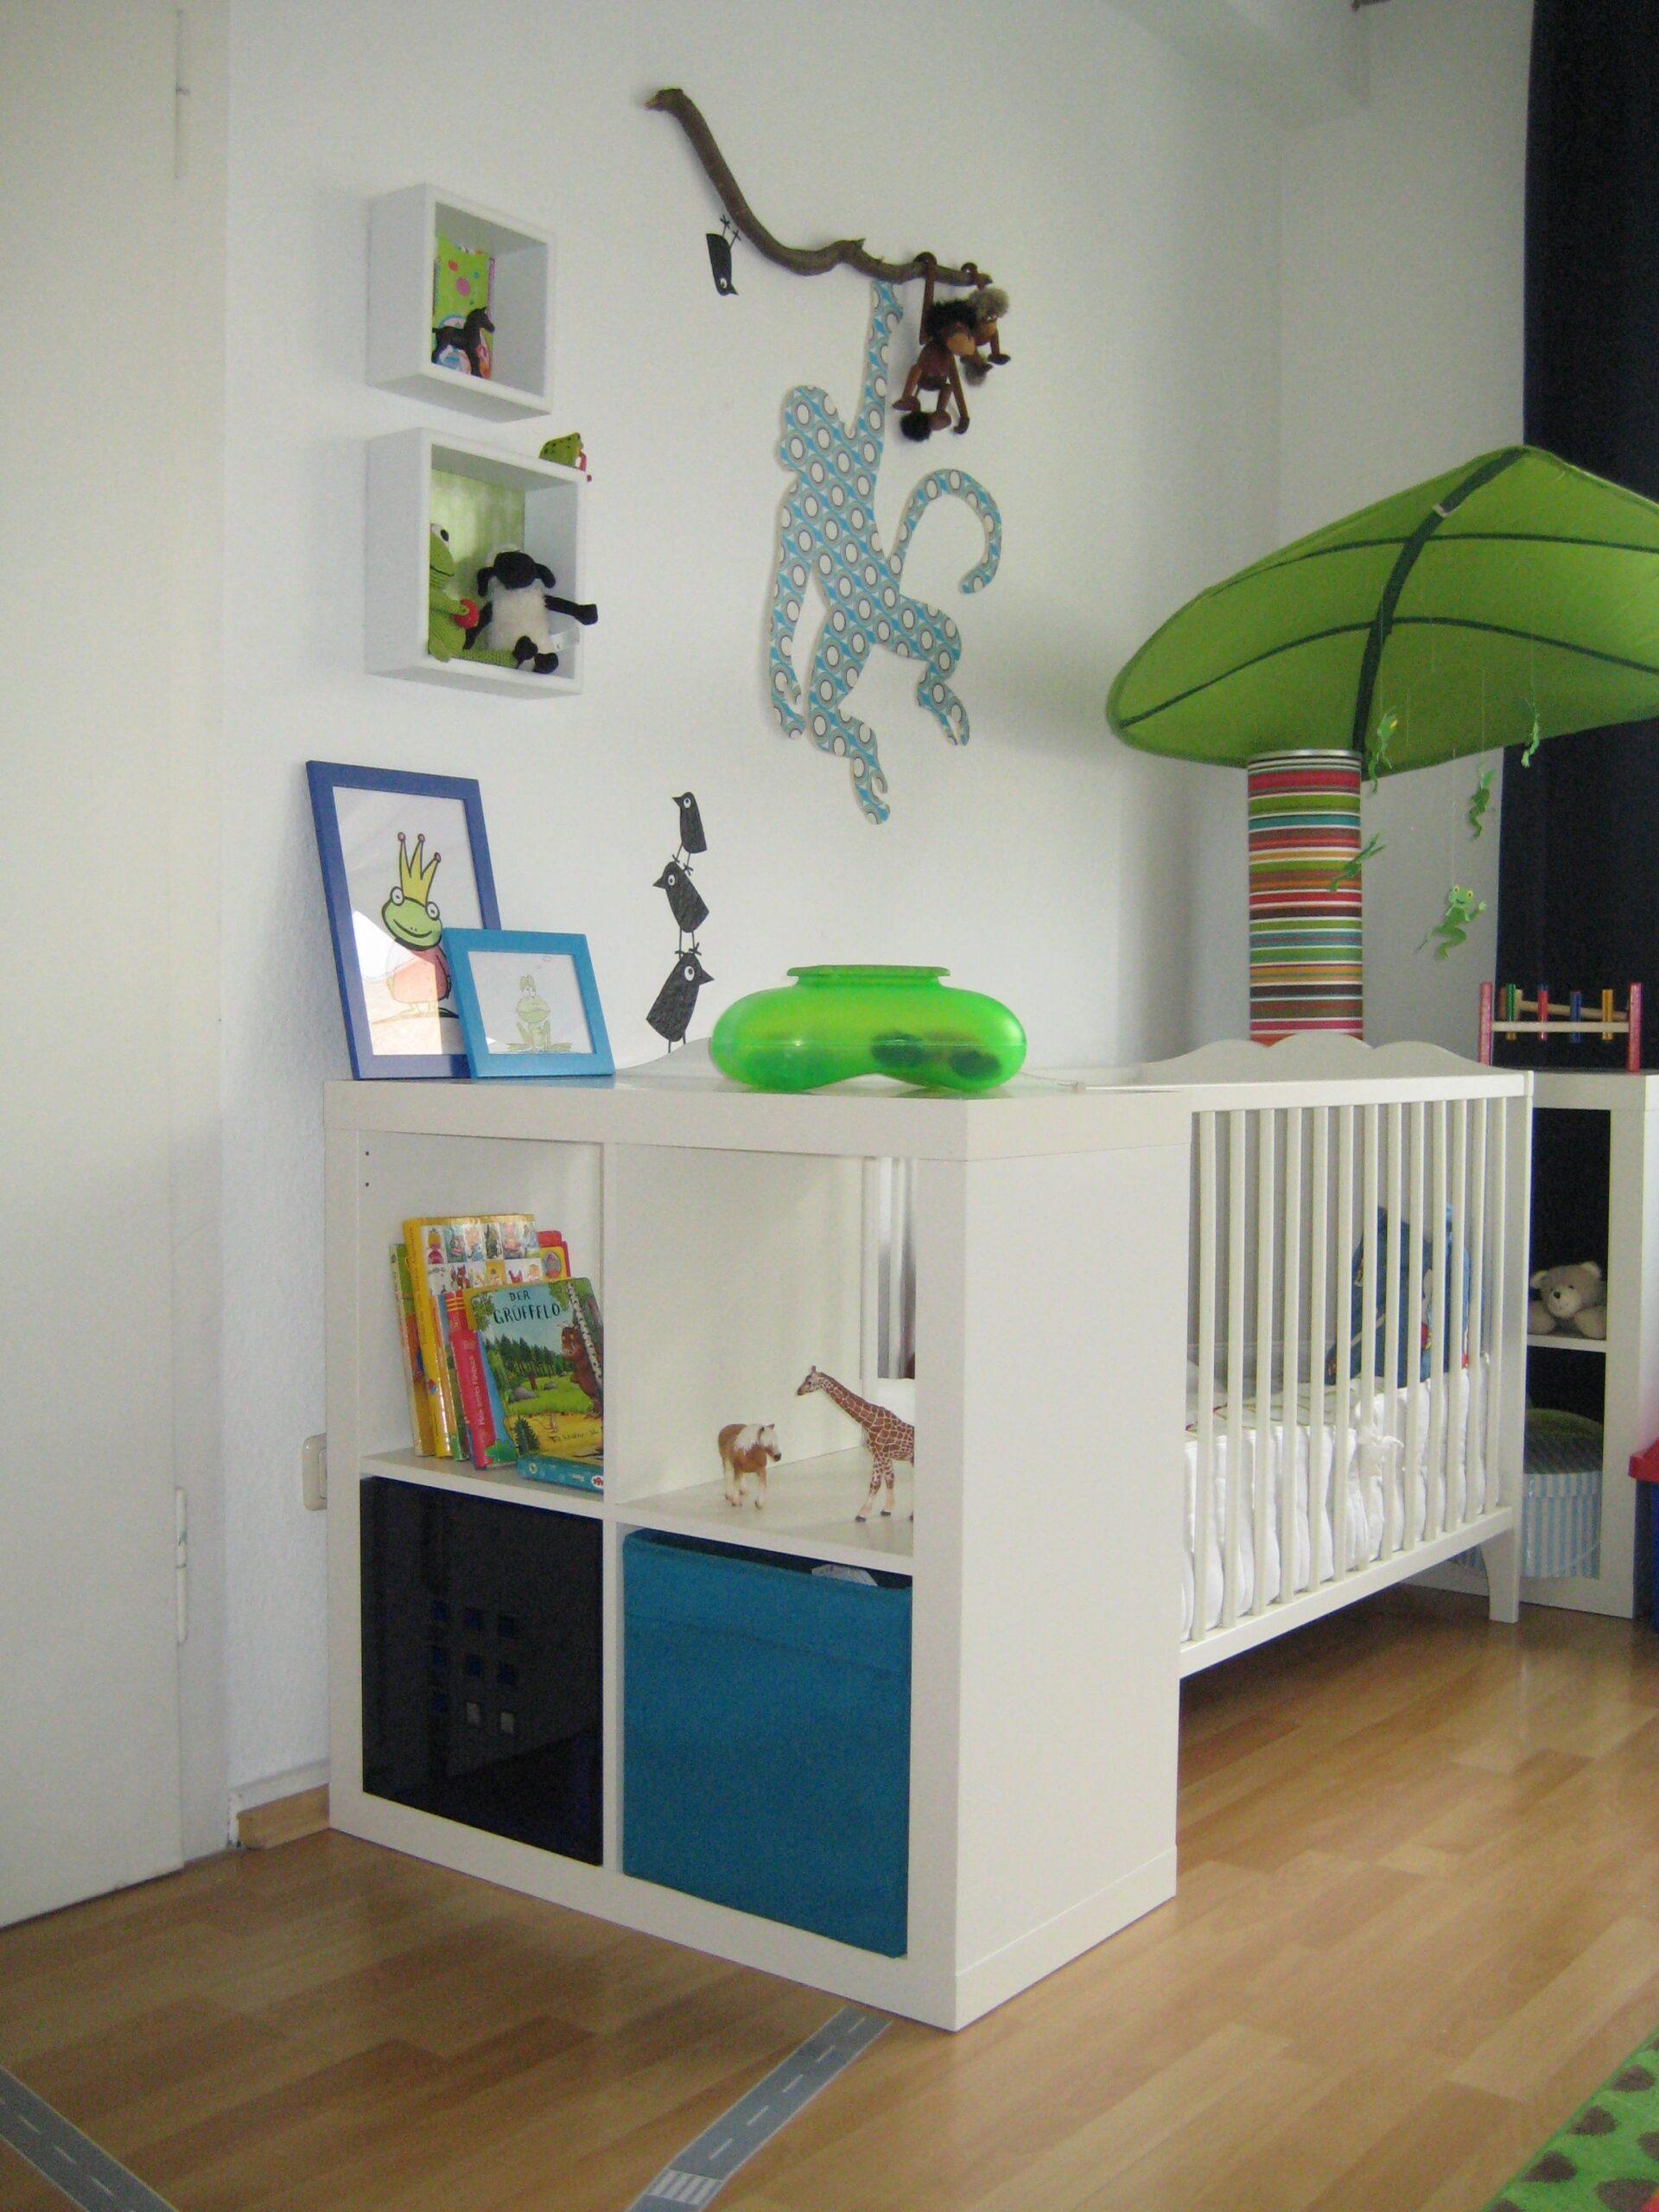 Full Size of Raumteiler Kinderzimmer Regal Sofa Regale Weiß Kinderzimmer Raumteiler Kinderzimmer